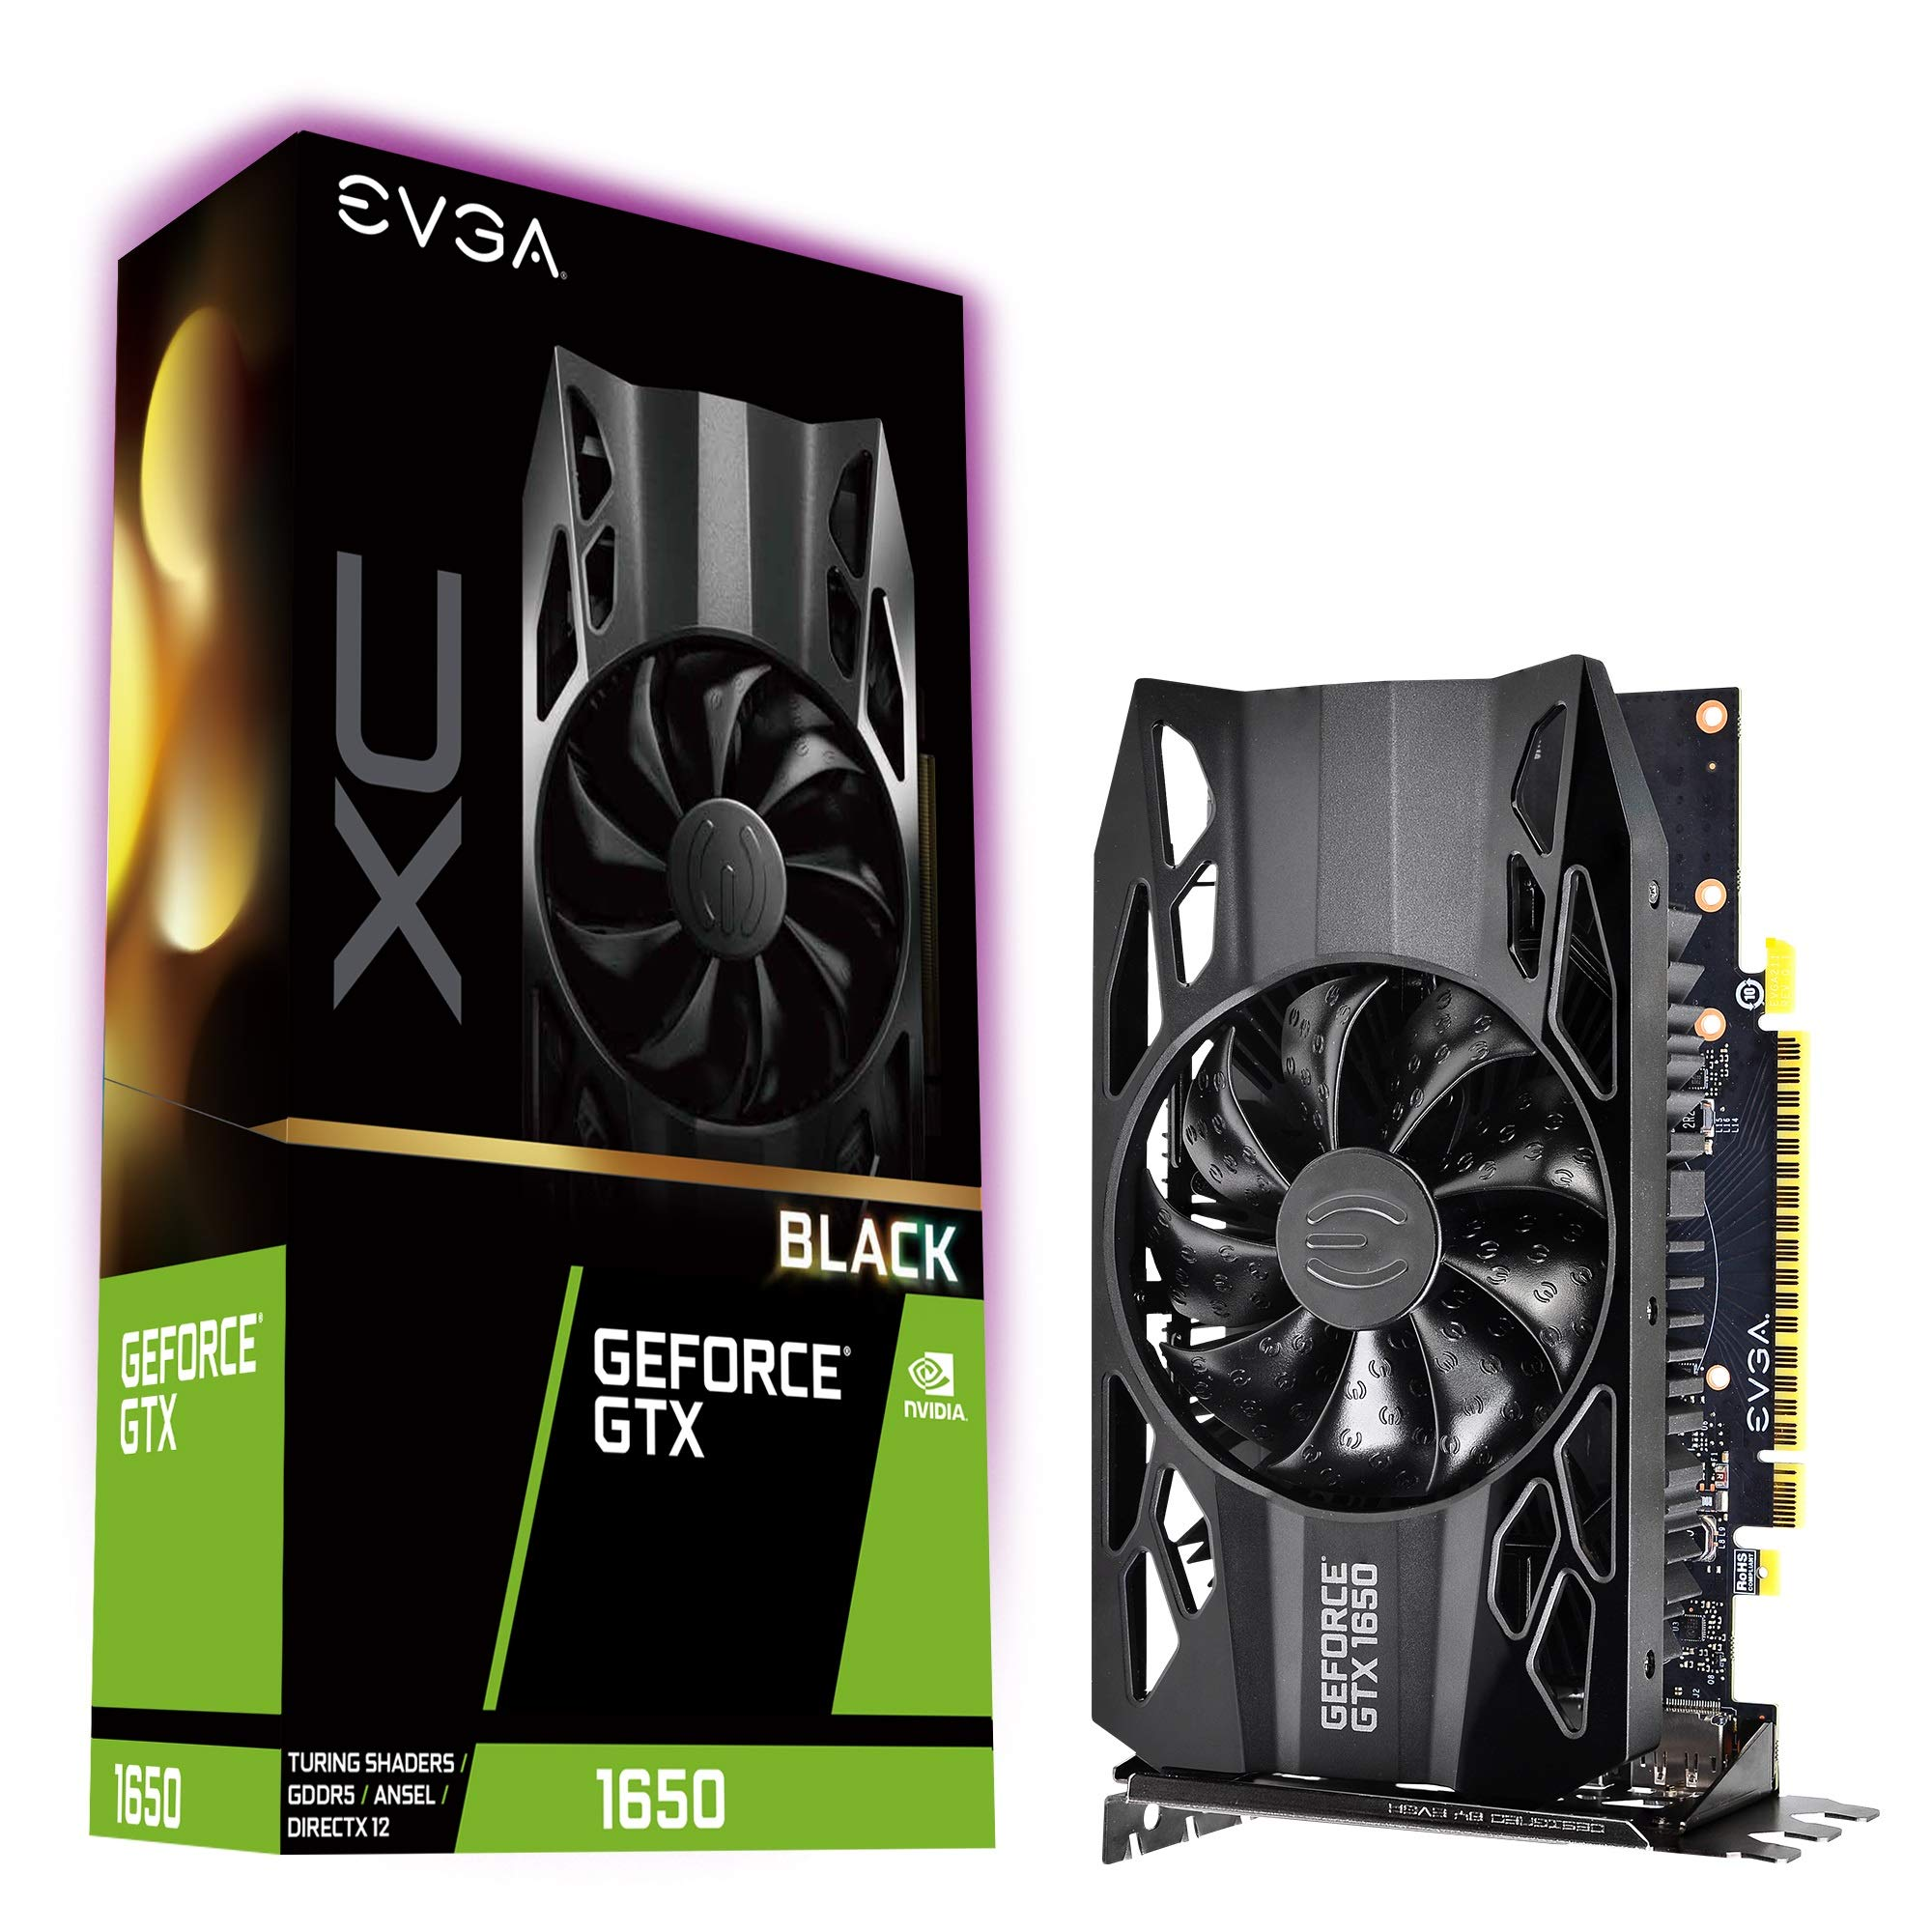 EVGA GeForce GTX 1650 XC Black Gaming, 4GB GDDR5, 04G-P4-1151-KR by EVGA